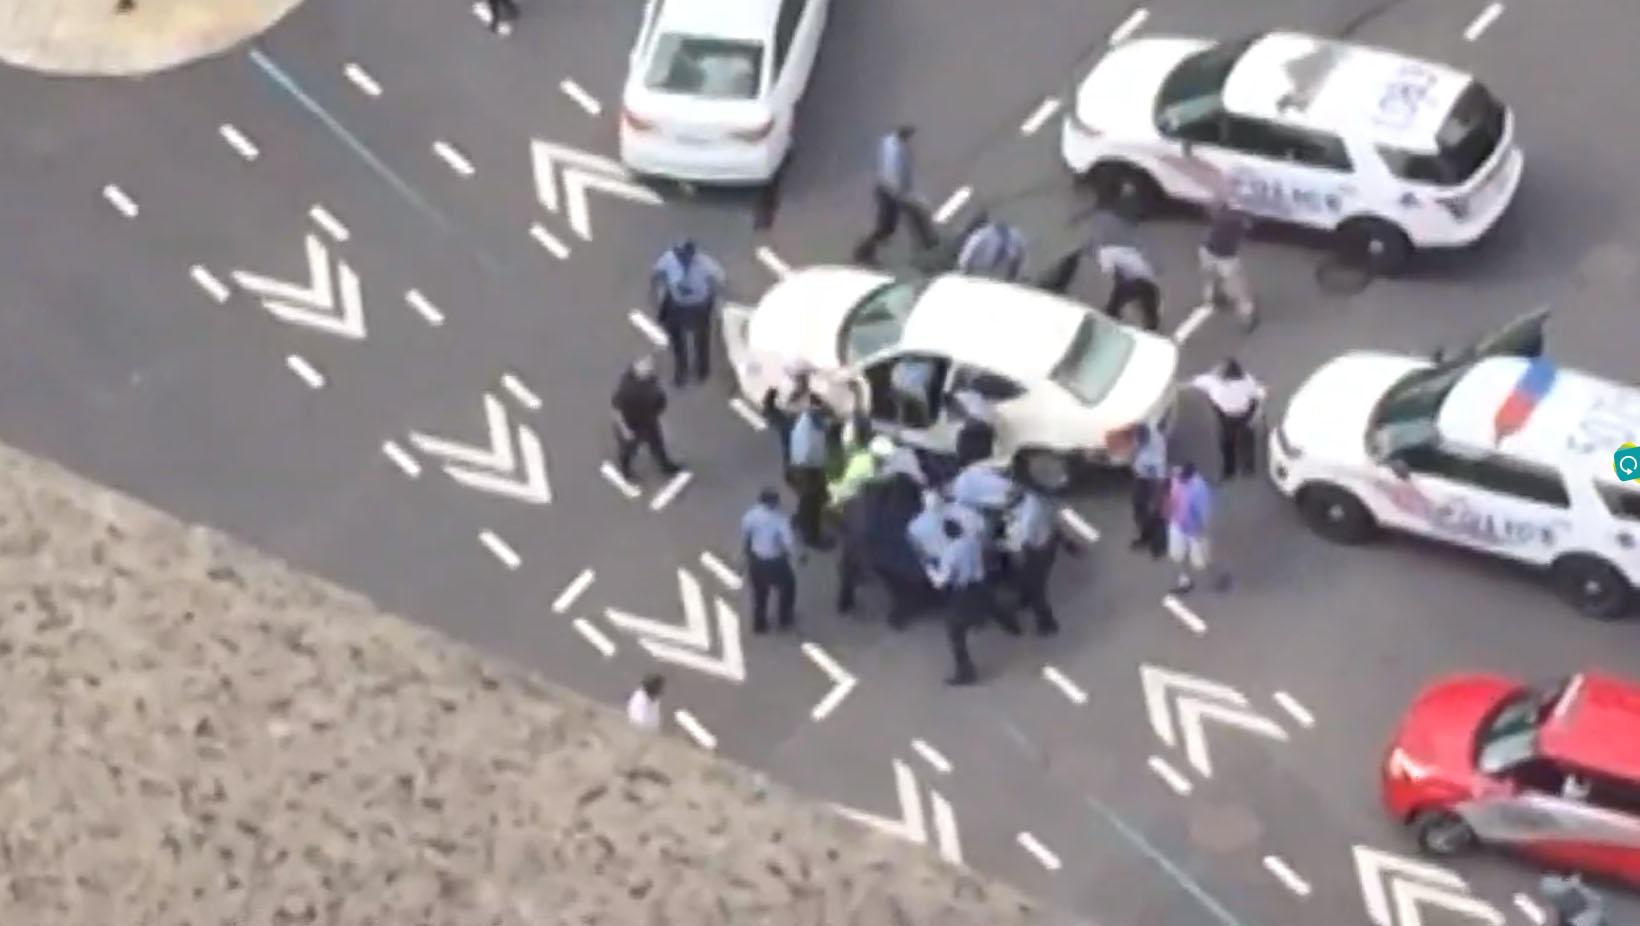 Massive police response after assault suspect crashes car near D.C. Trump hotel